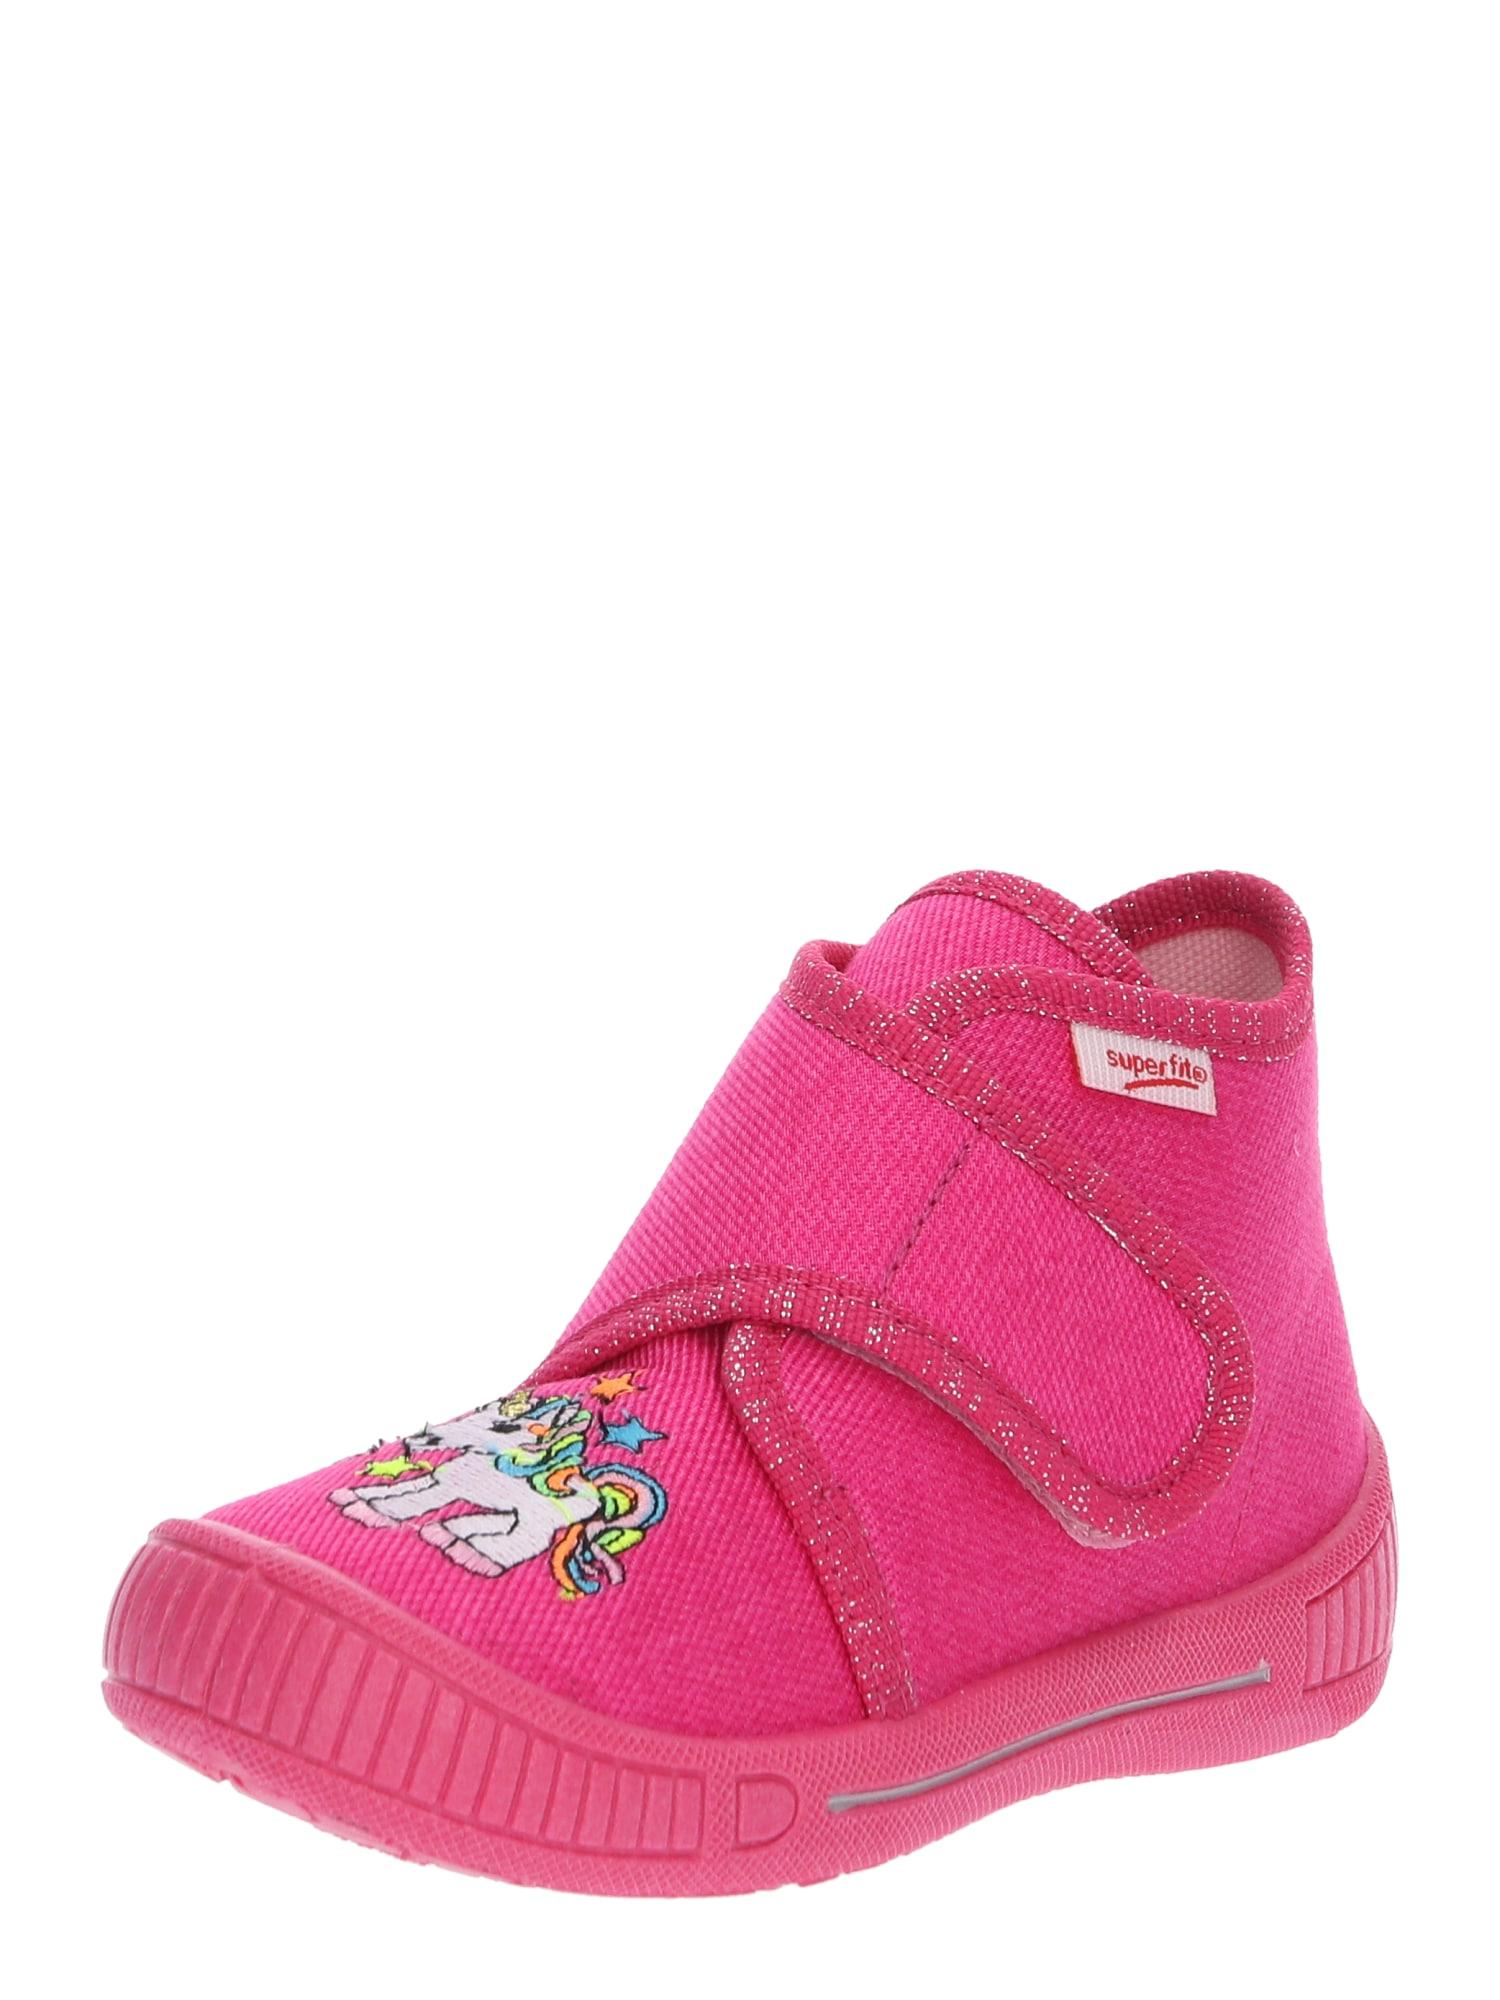 Pantofle BULLY pink SUPERFIT